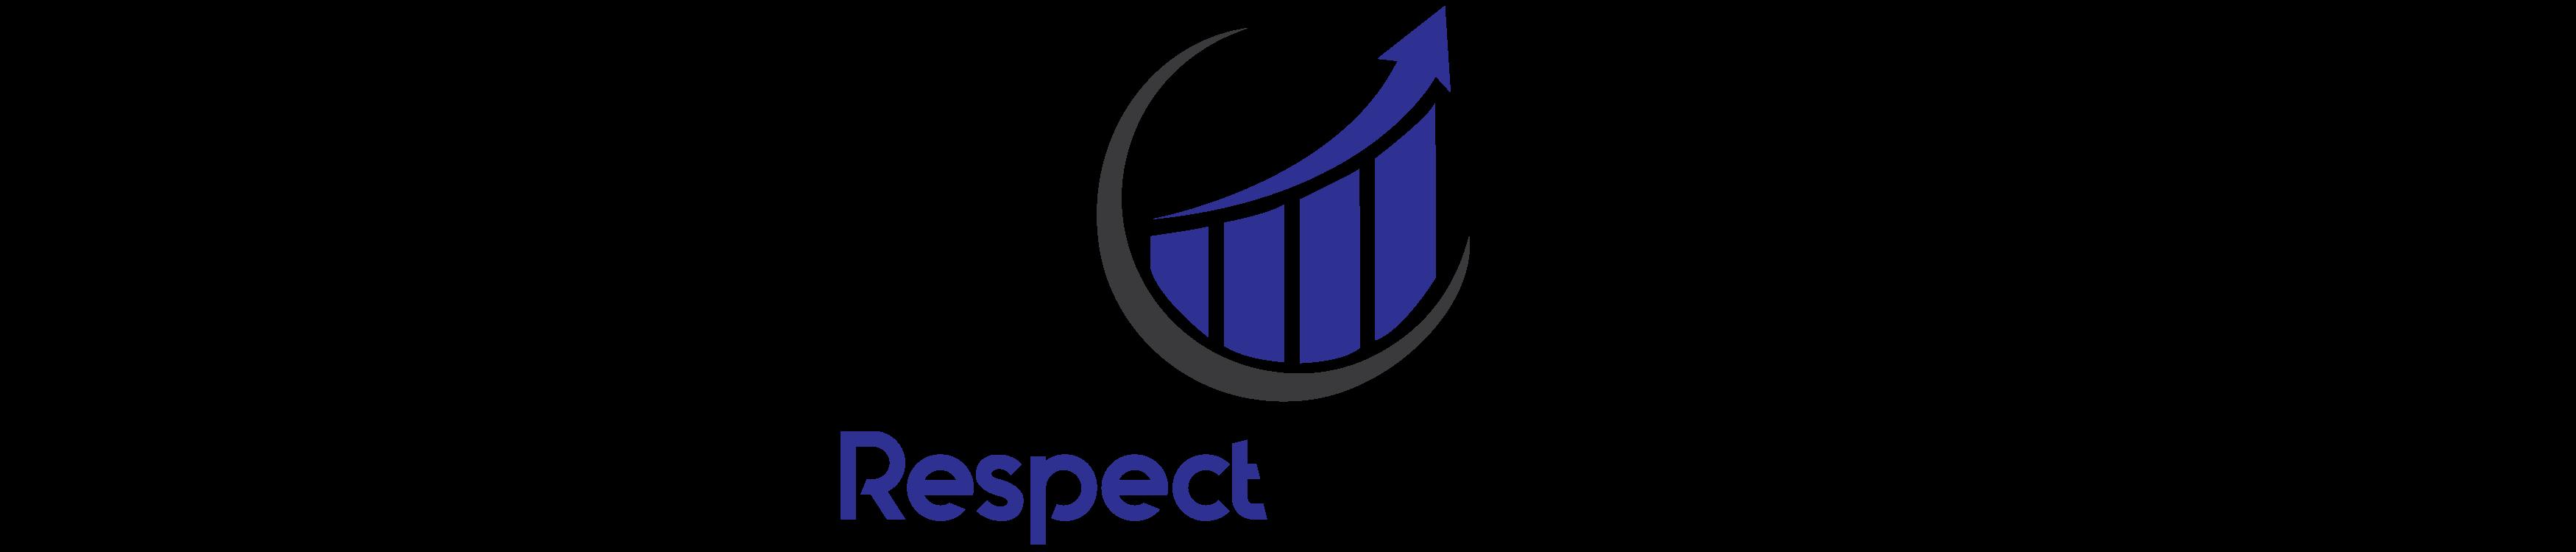 RespectStrategy